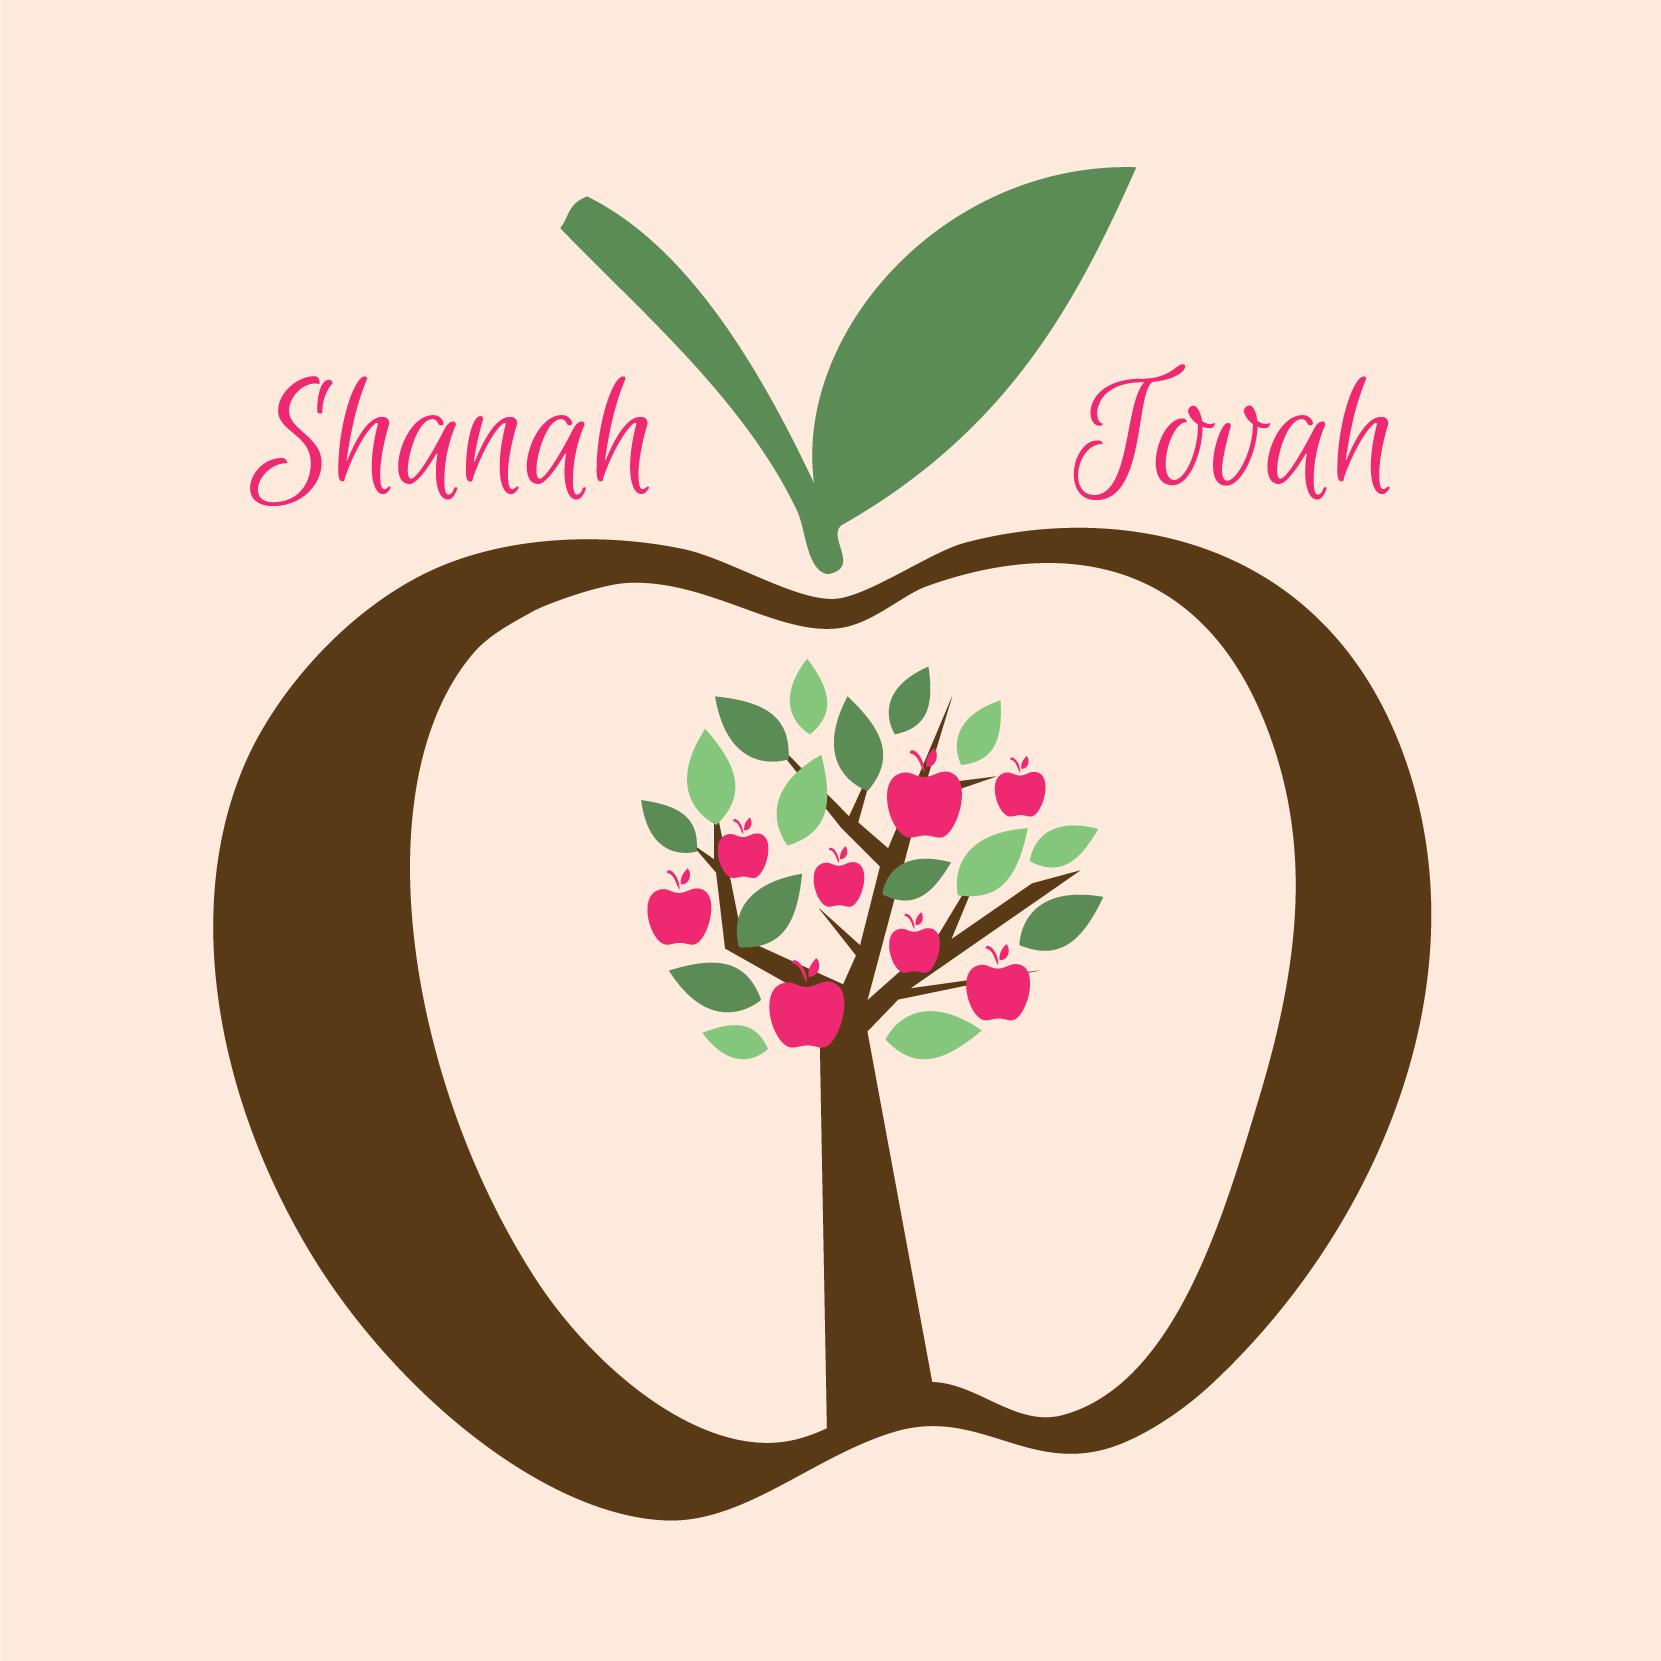 rosh hashanah greeting cards - Google Search - Rosh Hashanah 2015 PNG